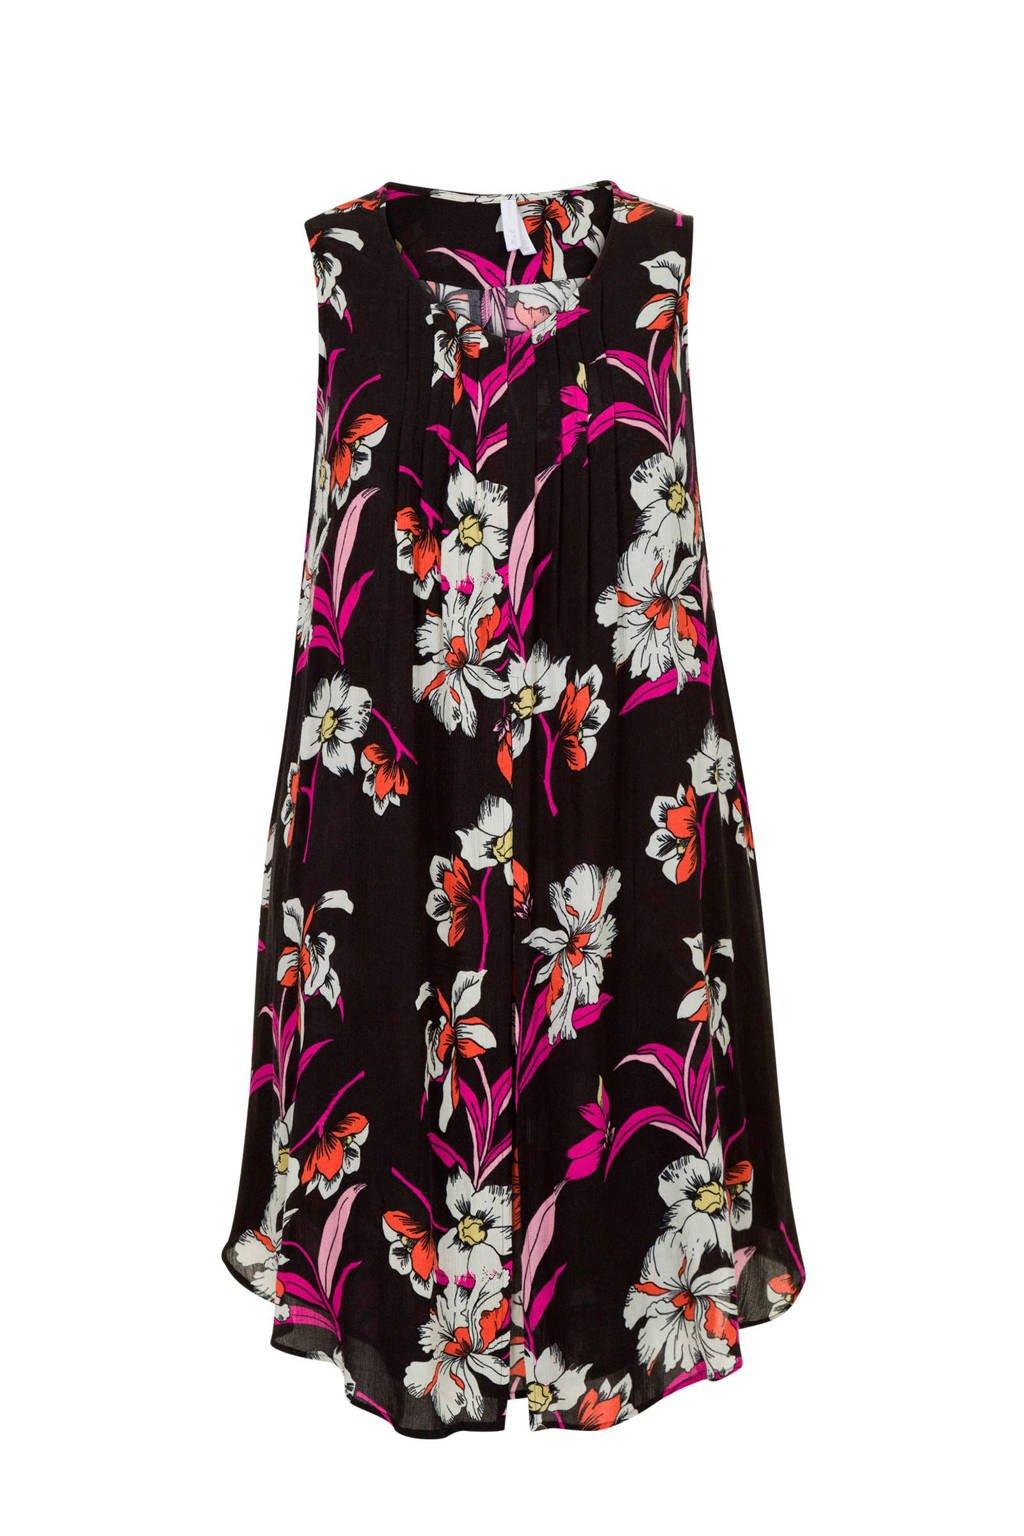 Miss Etam Plus gebloemde jurk, Zwart